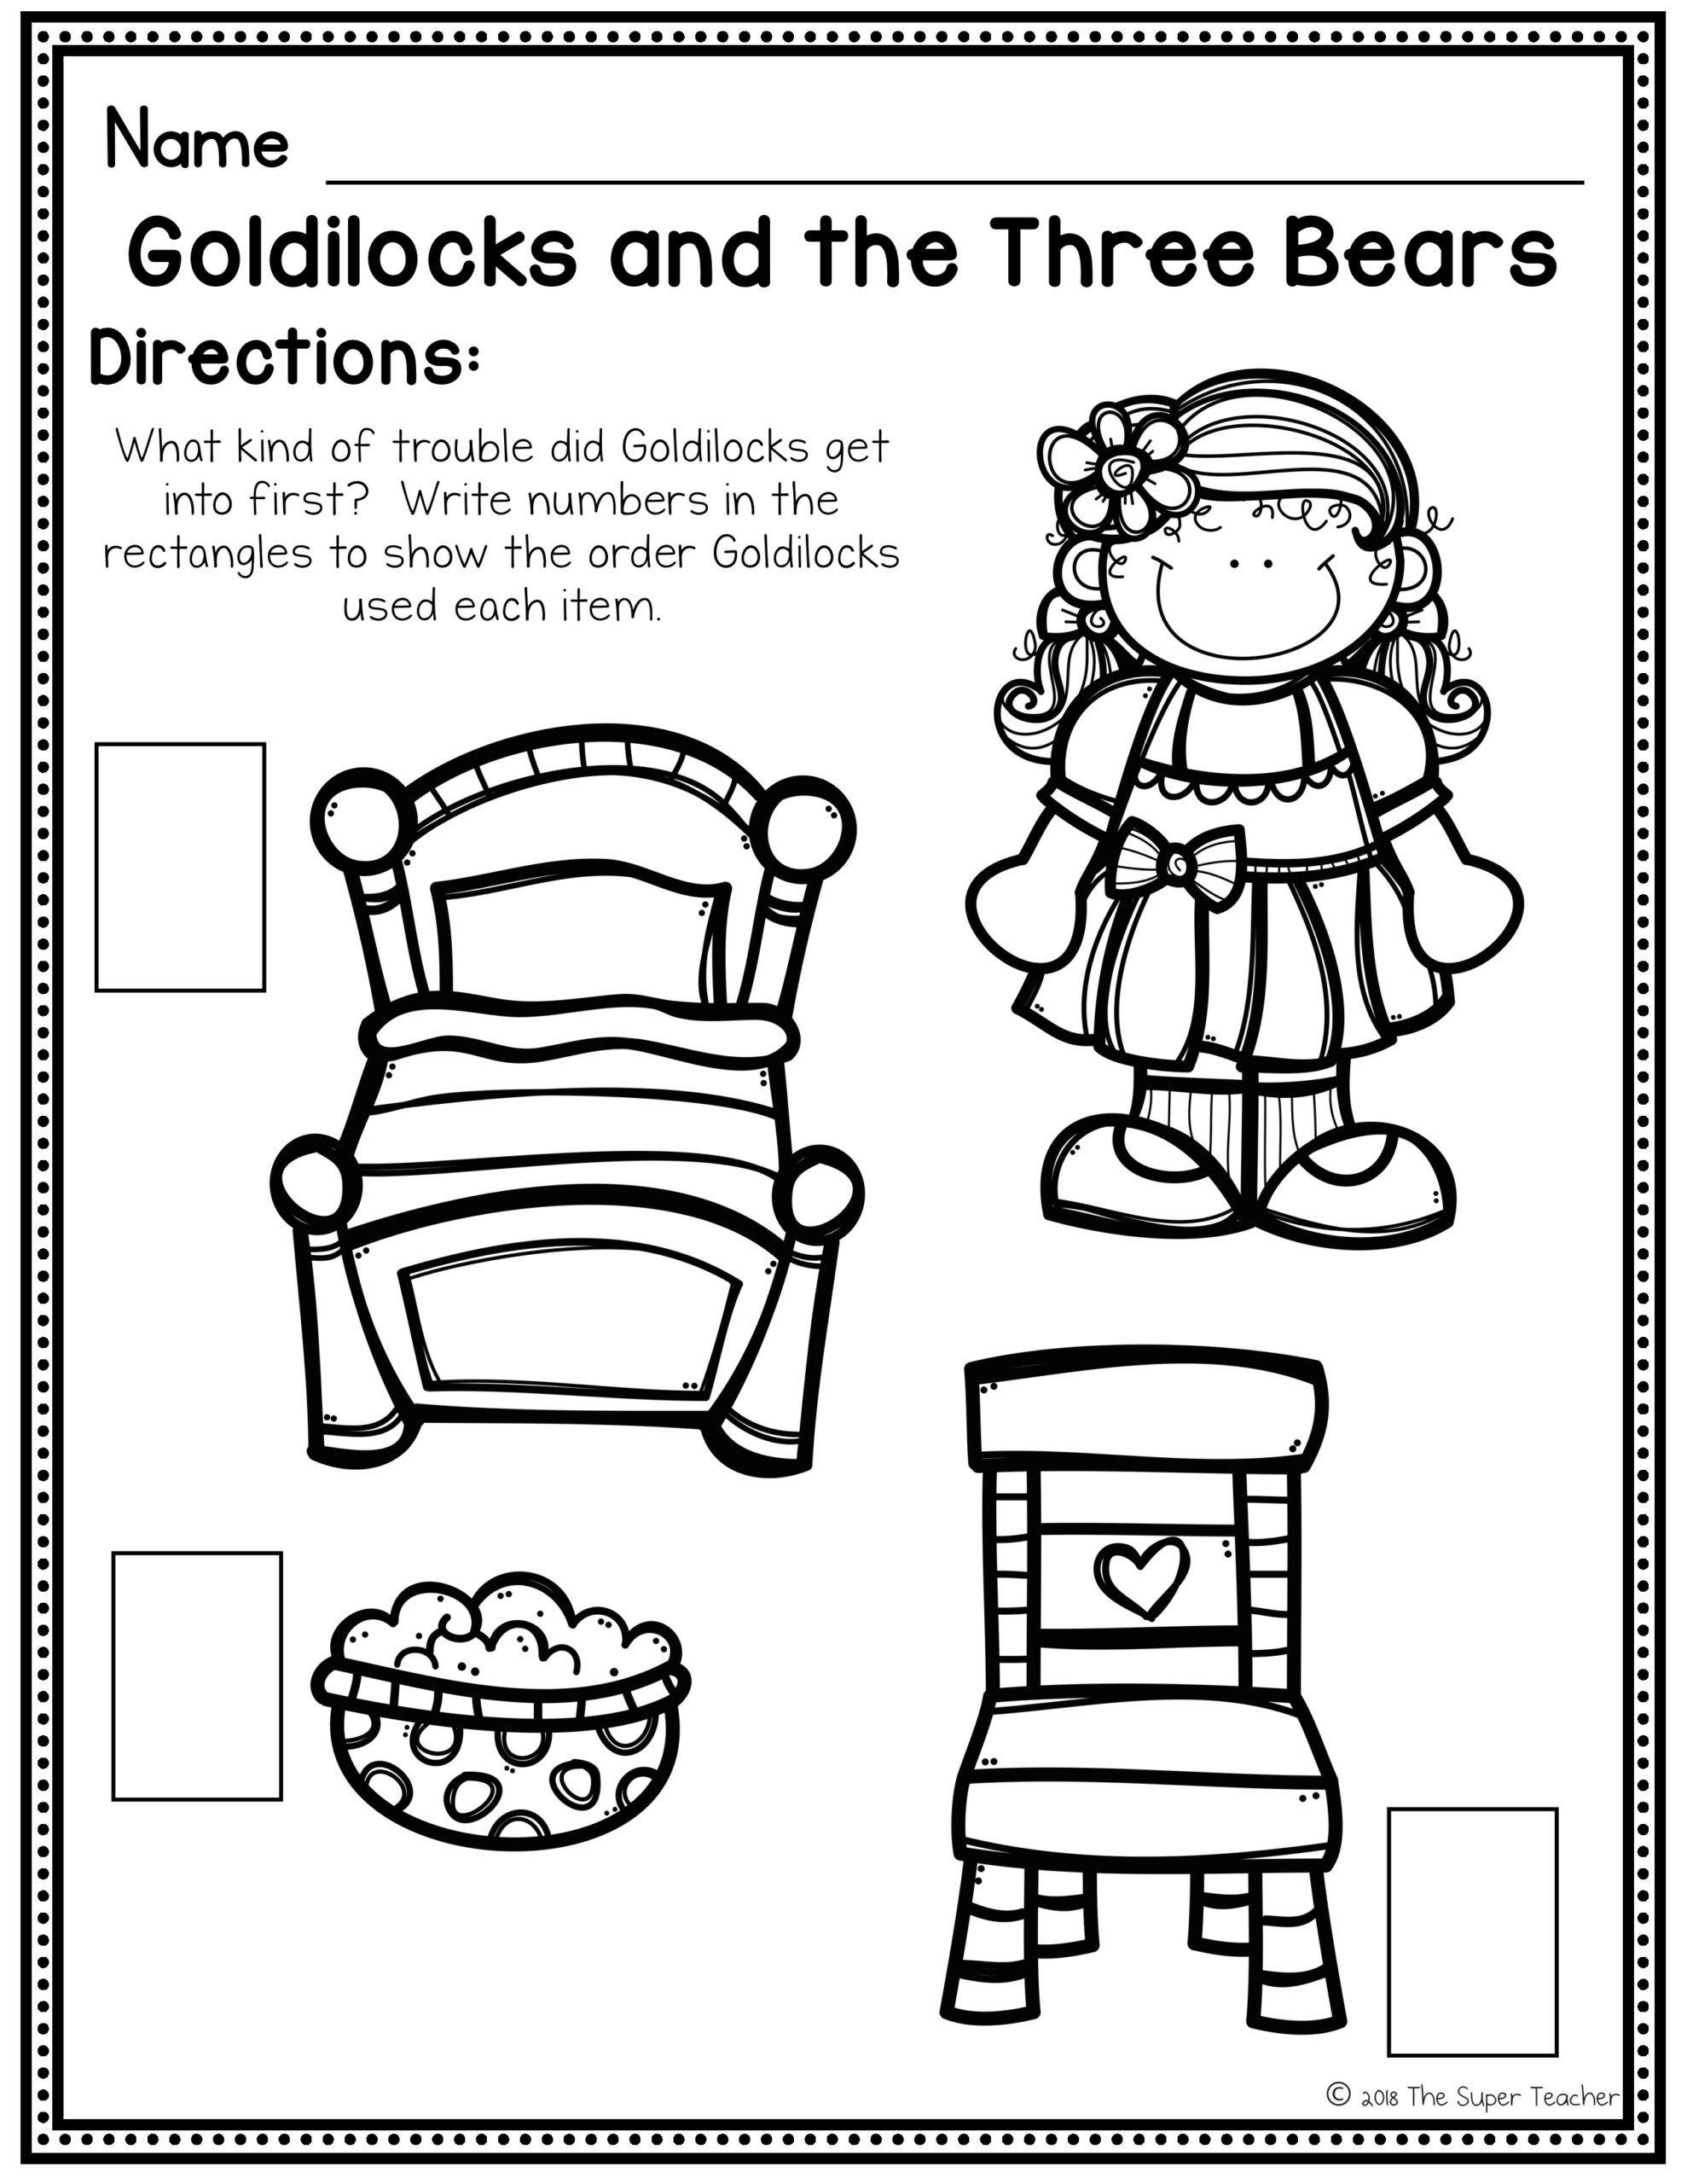 Retell Worksheet First Grade Goldilocks And The Three Bears Elements Retelling Make Super Teacher Worksheets Kindergarten Worksheets Math Division Worksheets [ 2560 x 1978 Pixel ]